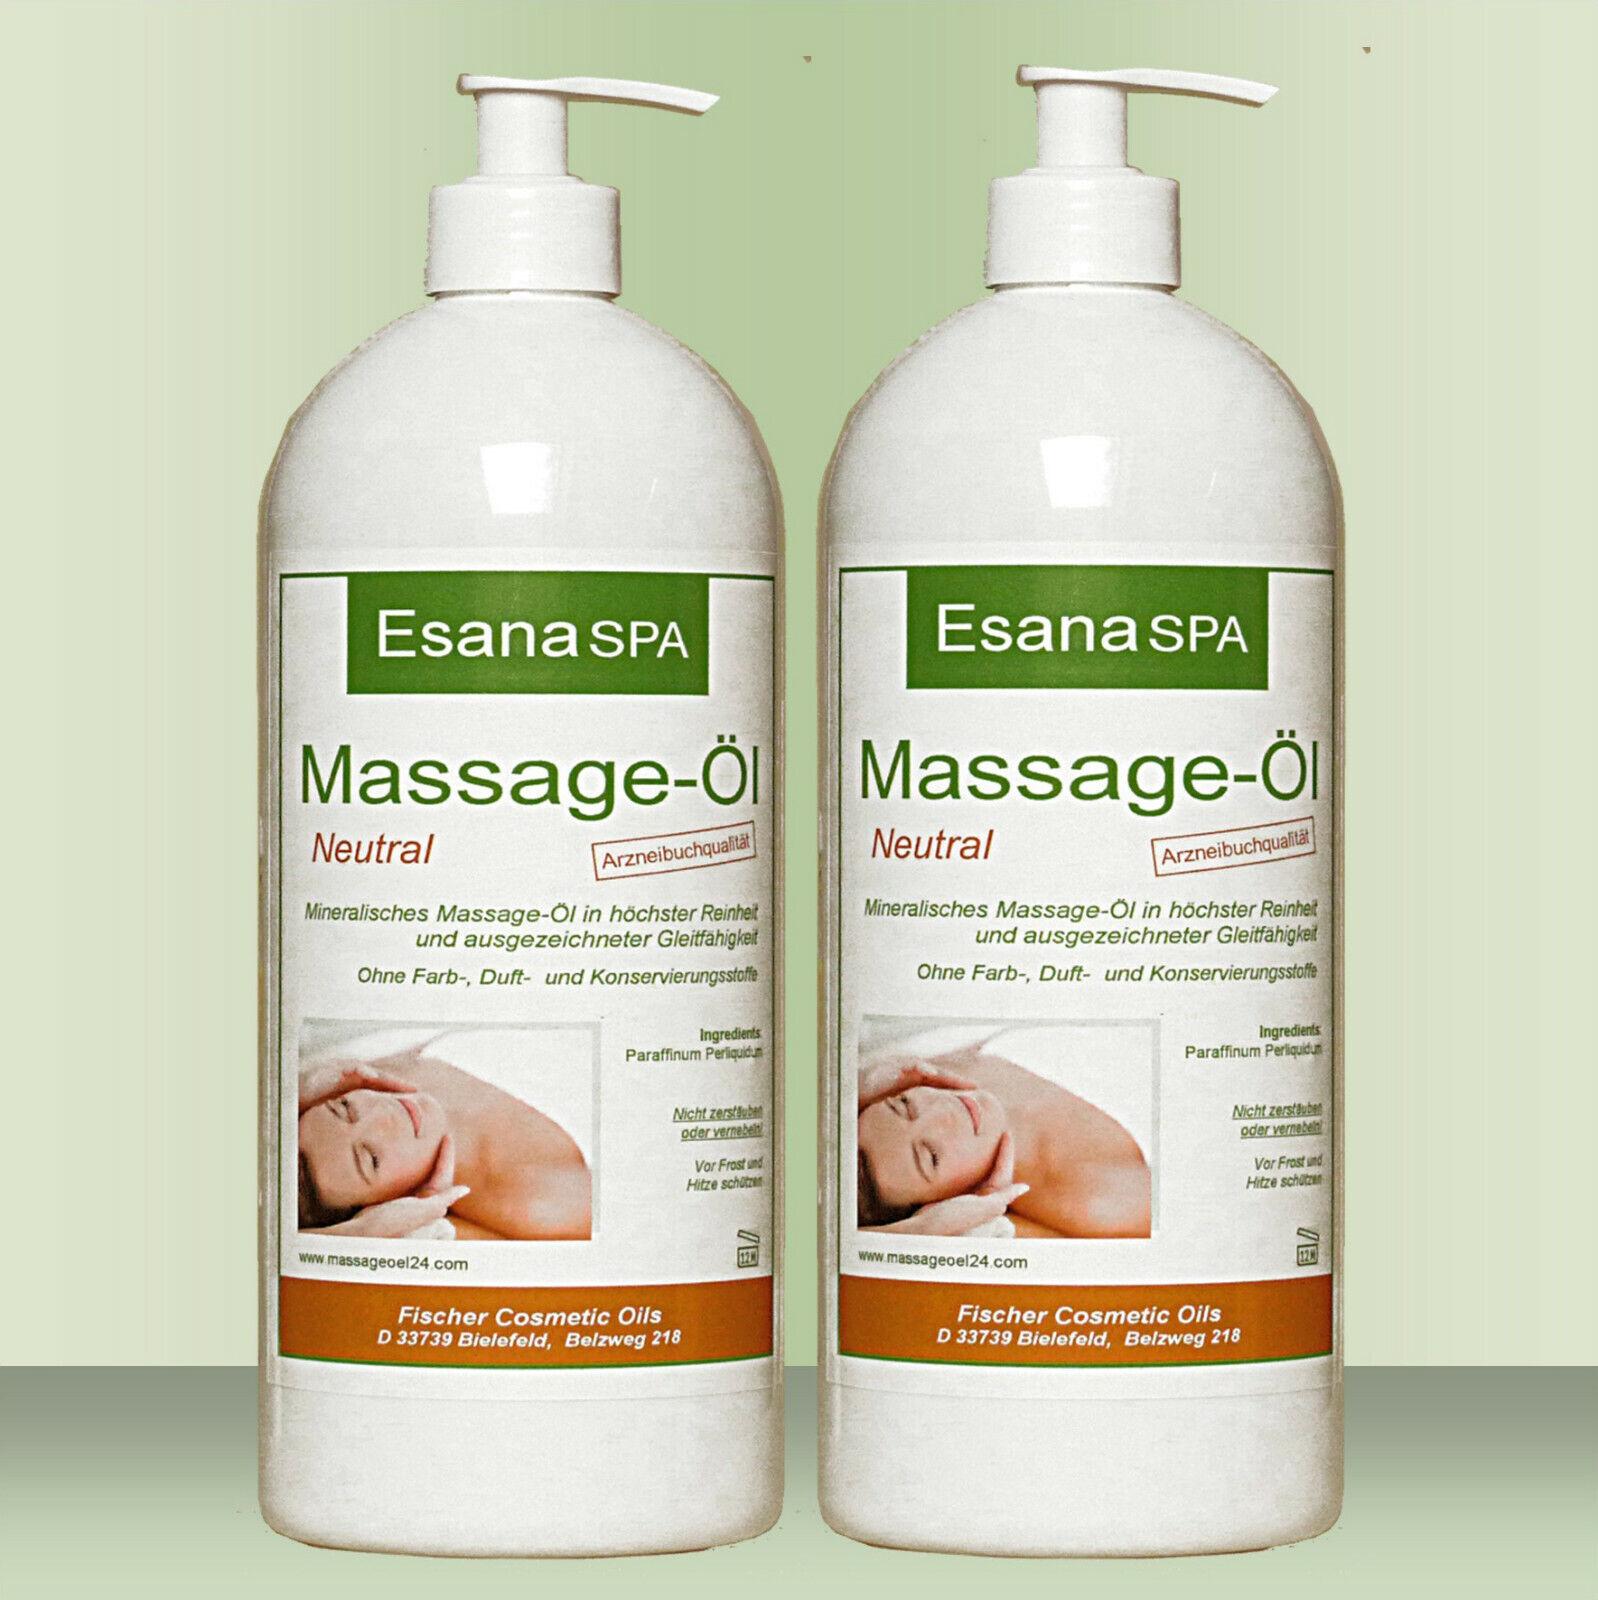 Esana SPA Massageöl neutral sanft & soft für Wellness/Physio 2x 500ml, +Pumpen